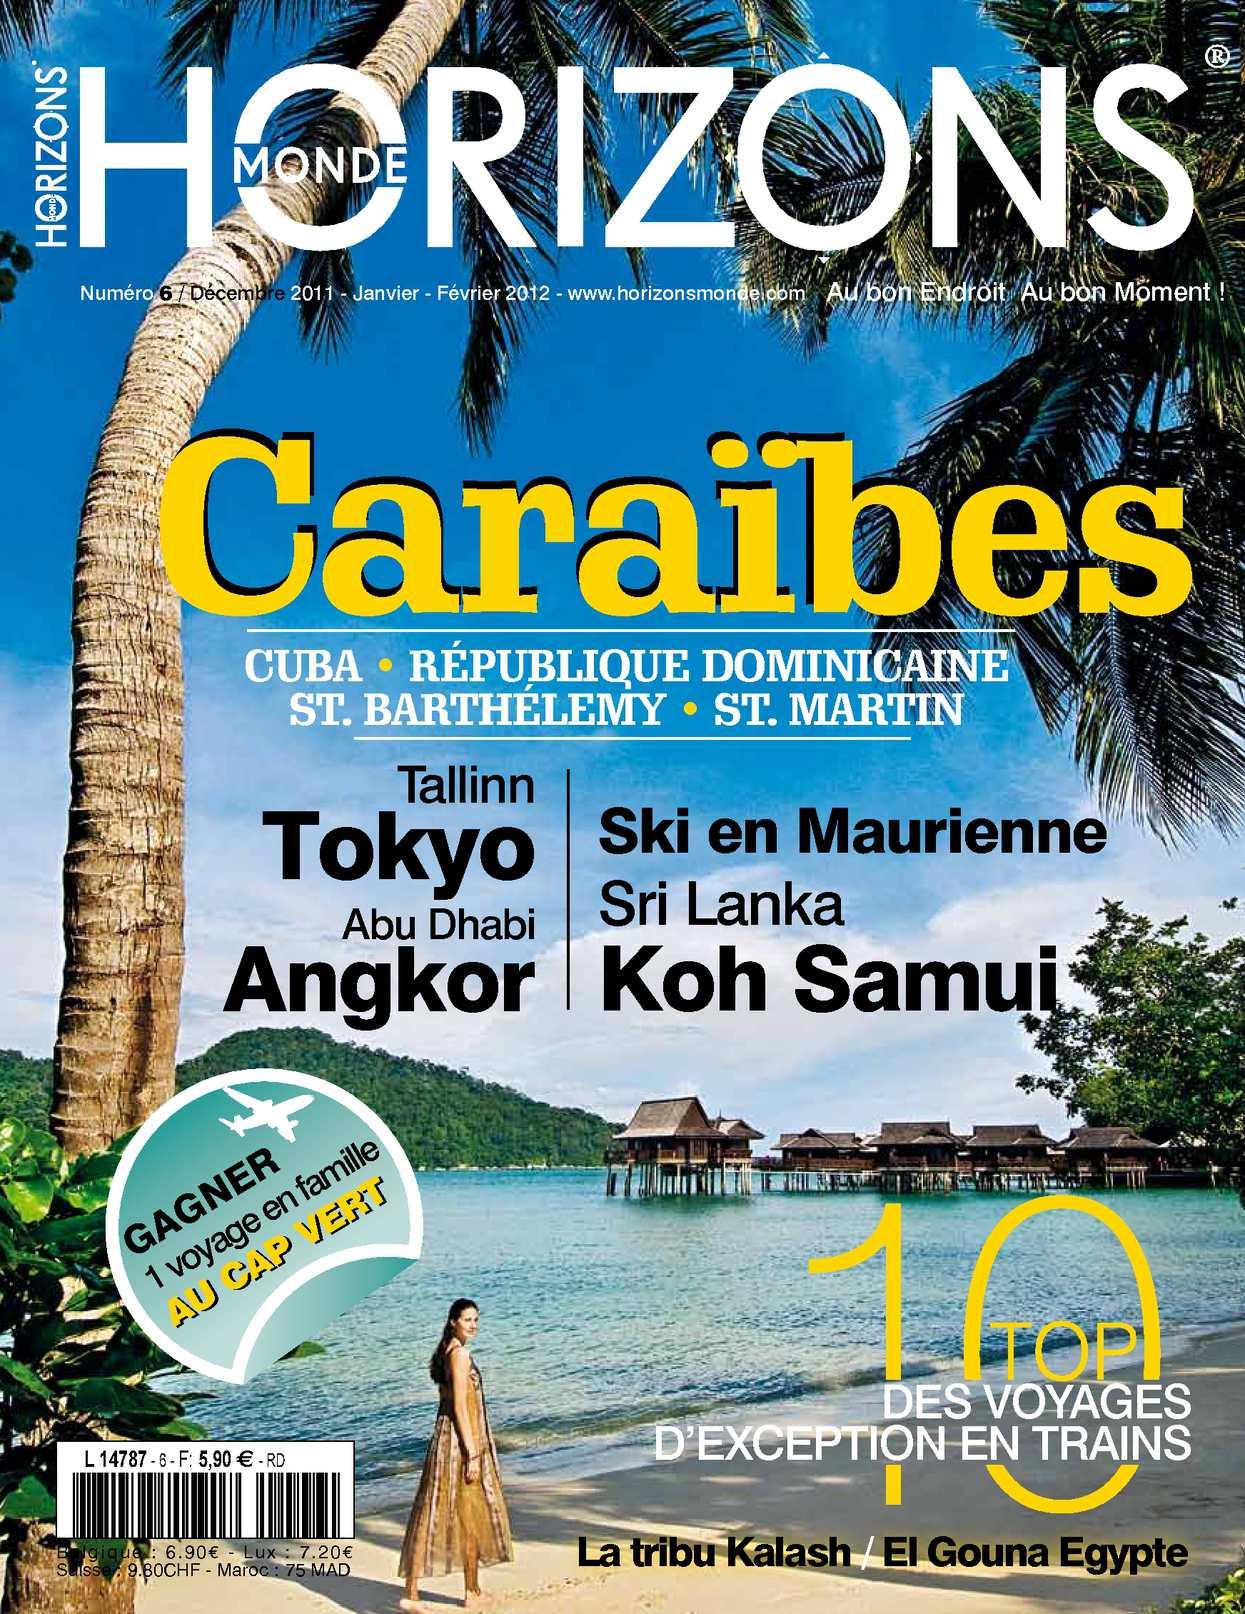 HORIZONS MONDE N°6 Hiver 2011/2012